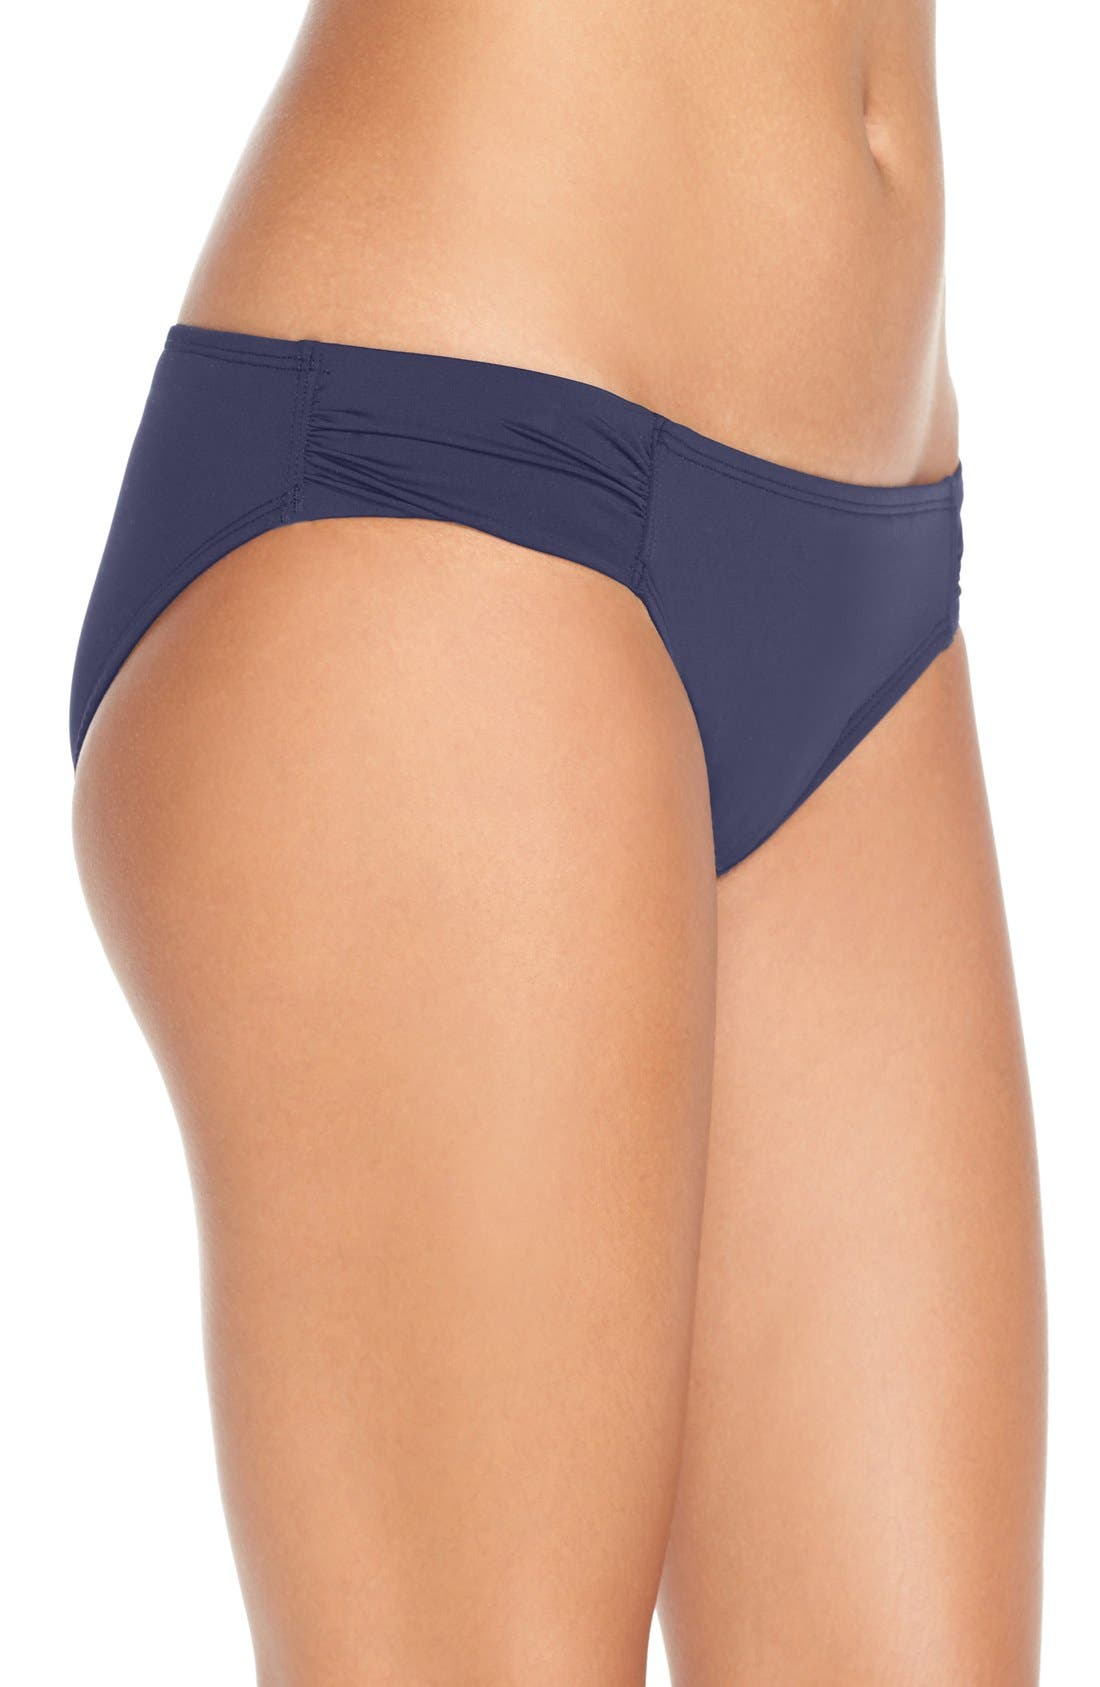 Alternate Image 3  - Tommy Bahama Side Shirred Hipster Bikini Bottoms